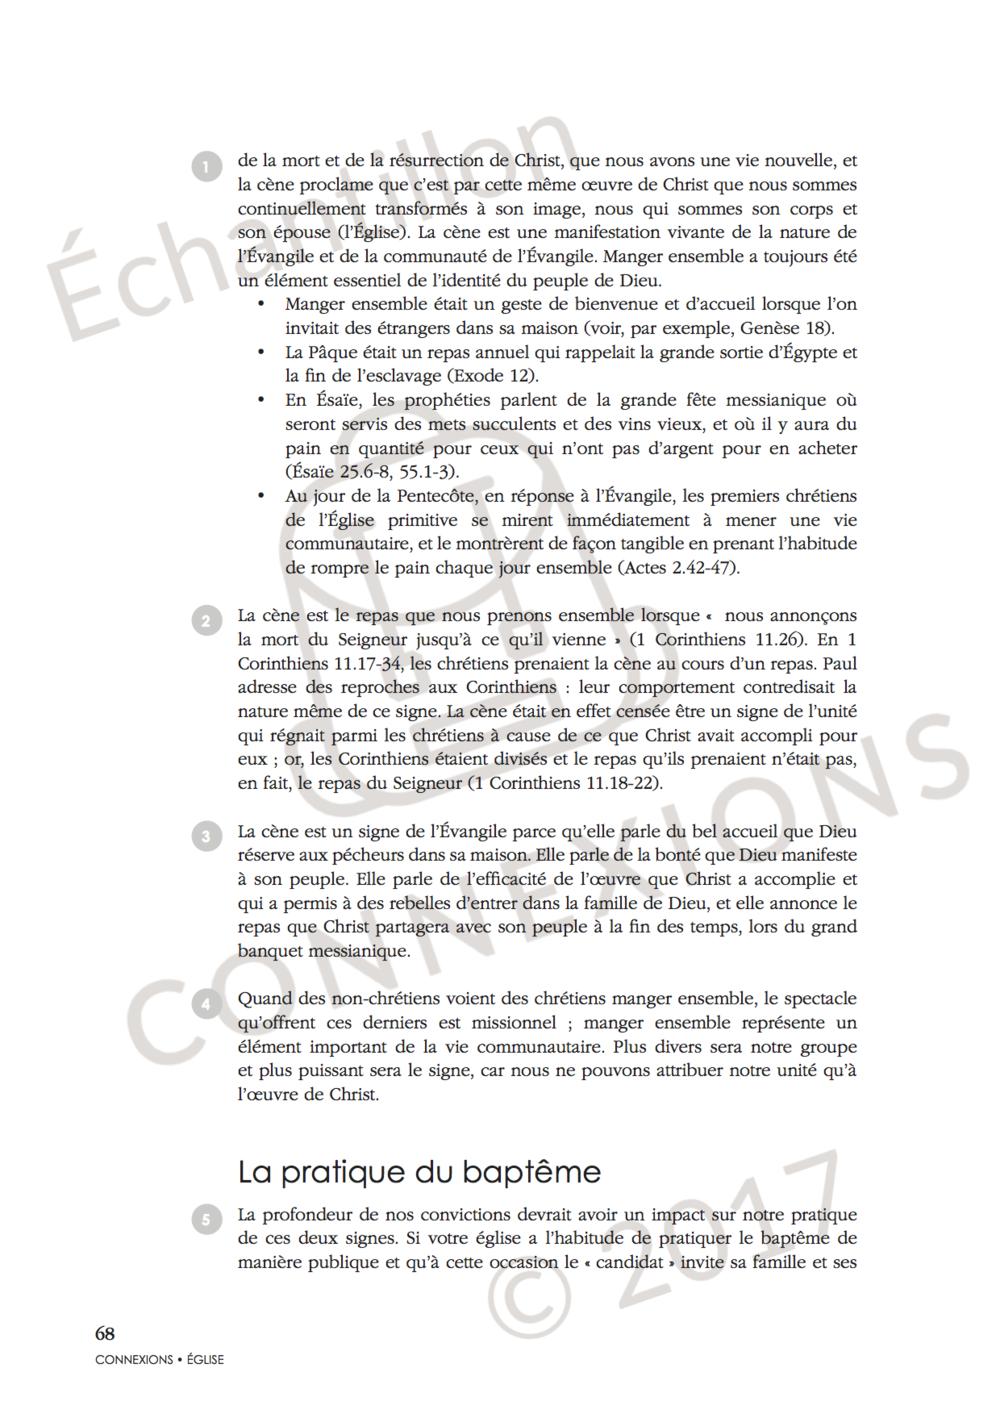 Garder le cap missionnel_sample_published.5.png